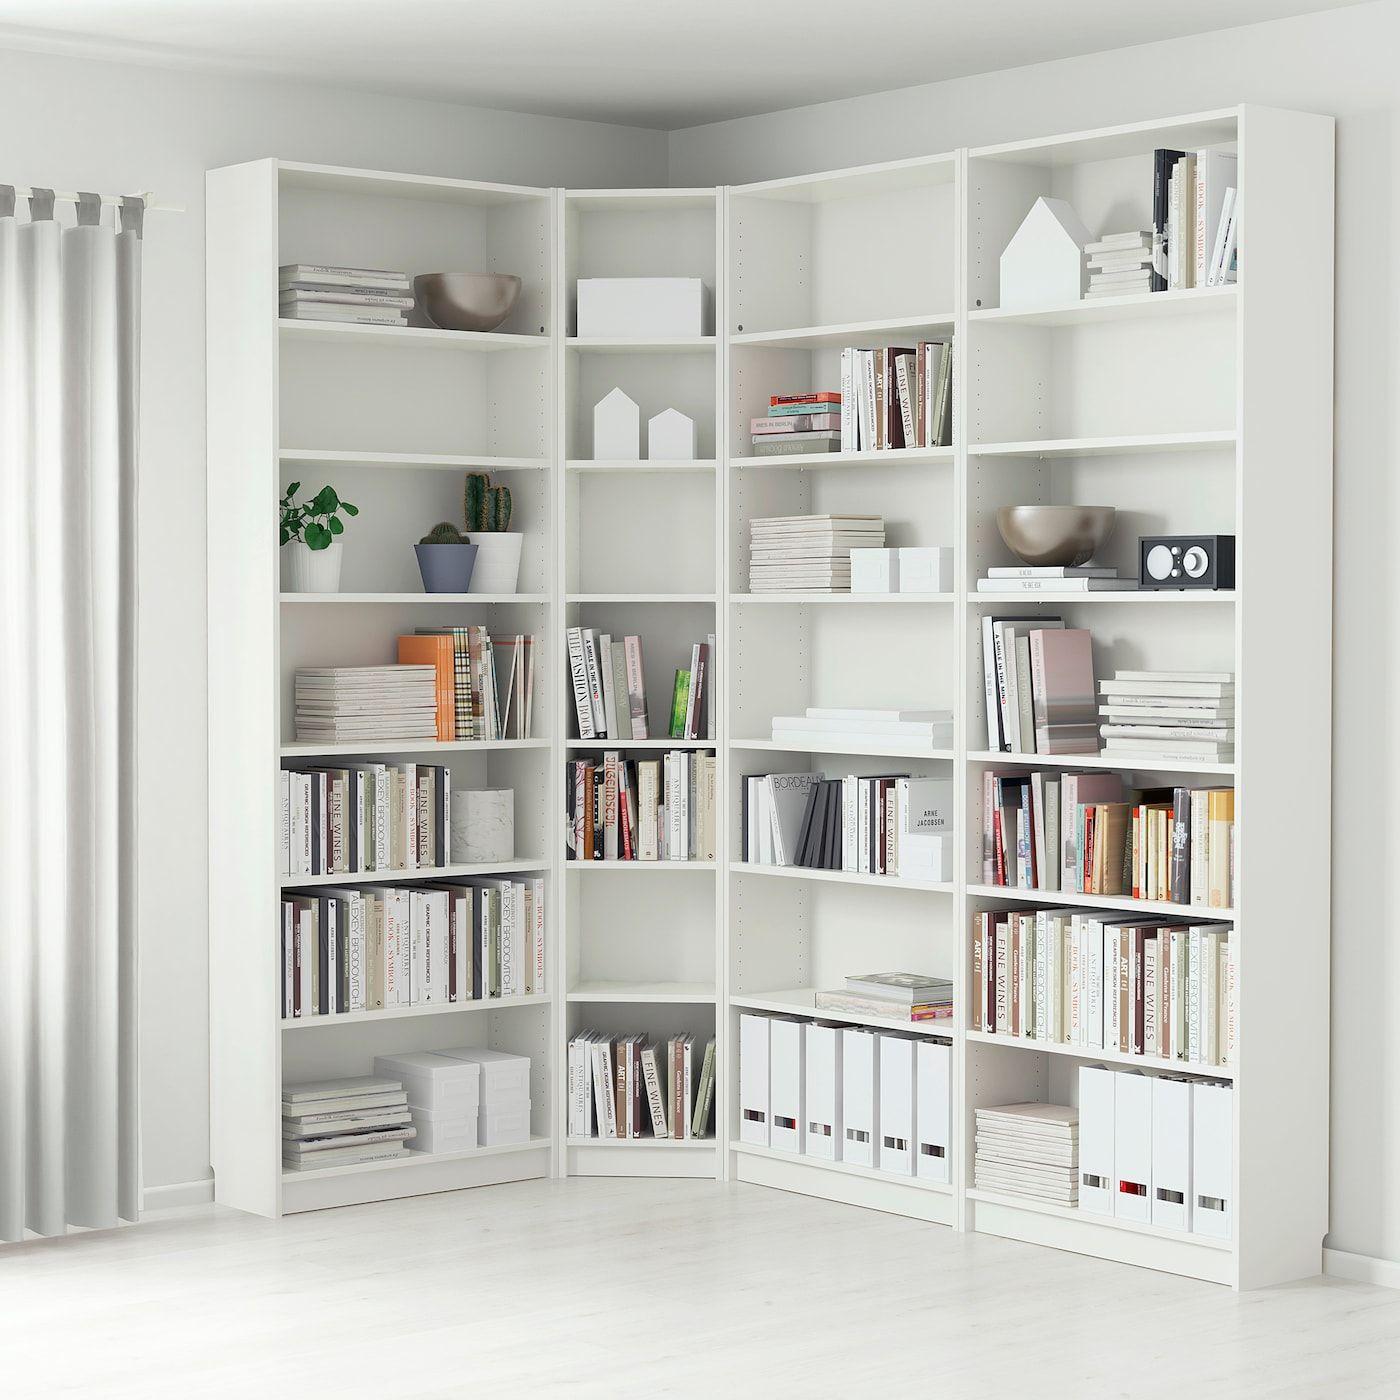 Billy Bookcase White Ikea In 2020 Billy Bucherregal Ikea Bucherschrank Bucherregal Weiss